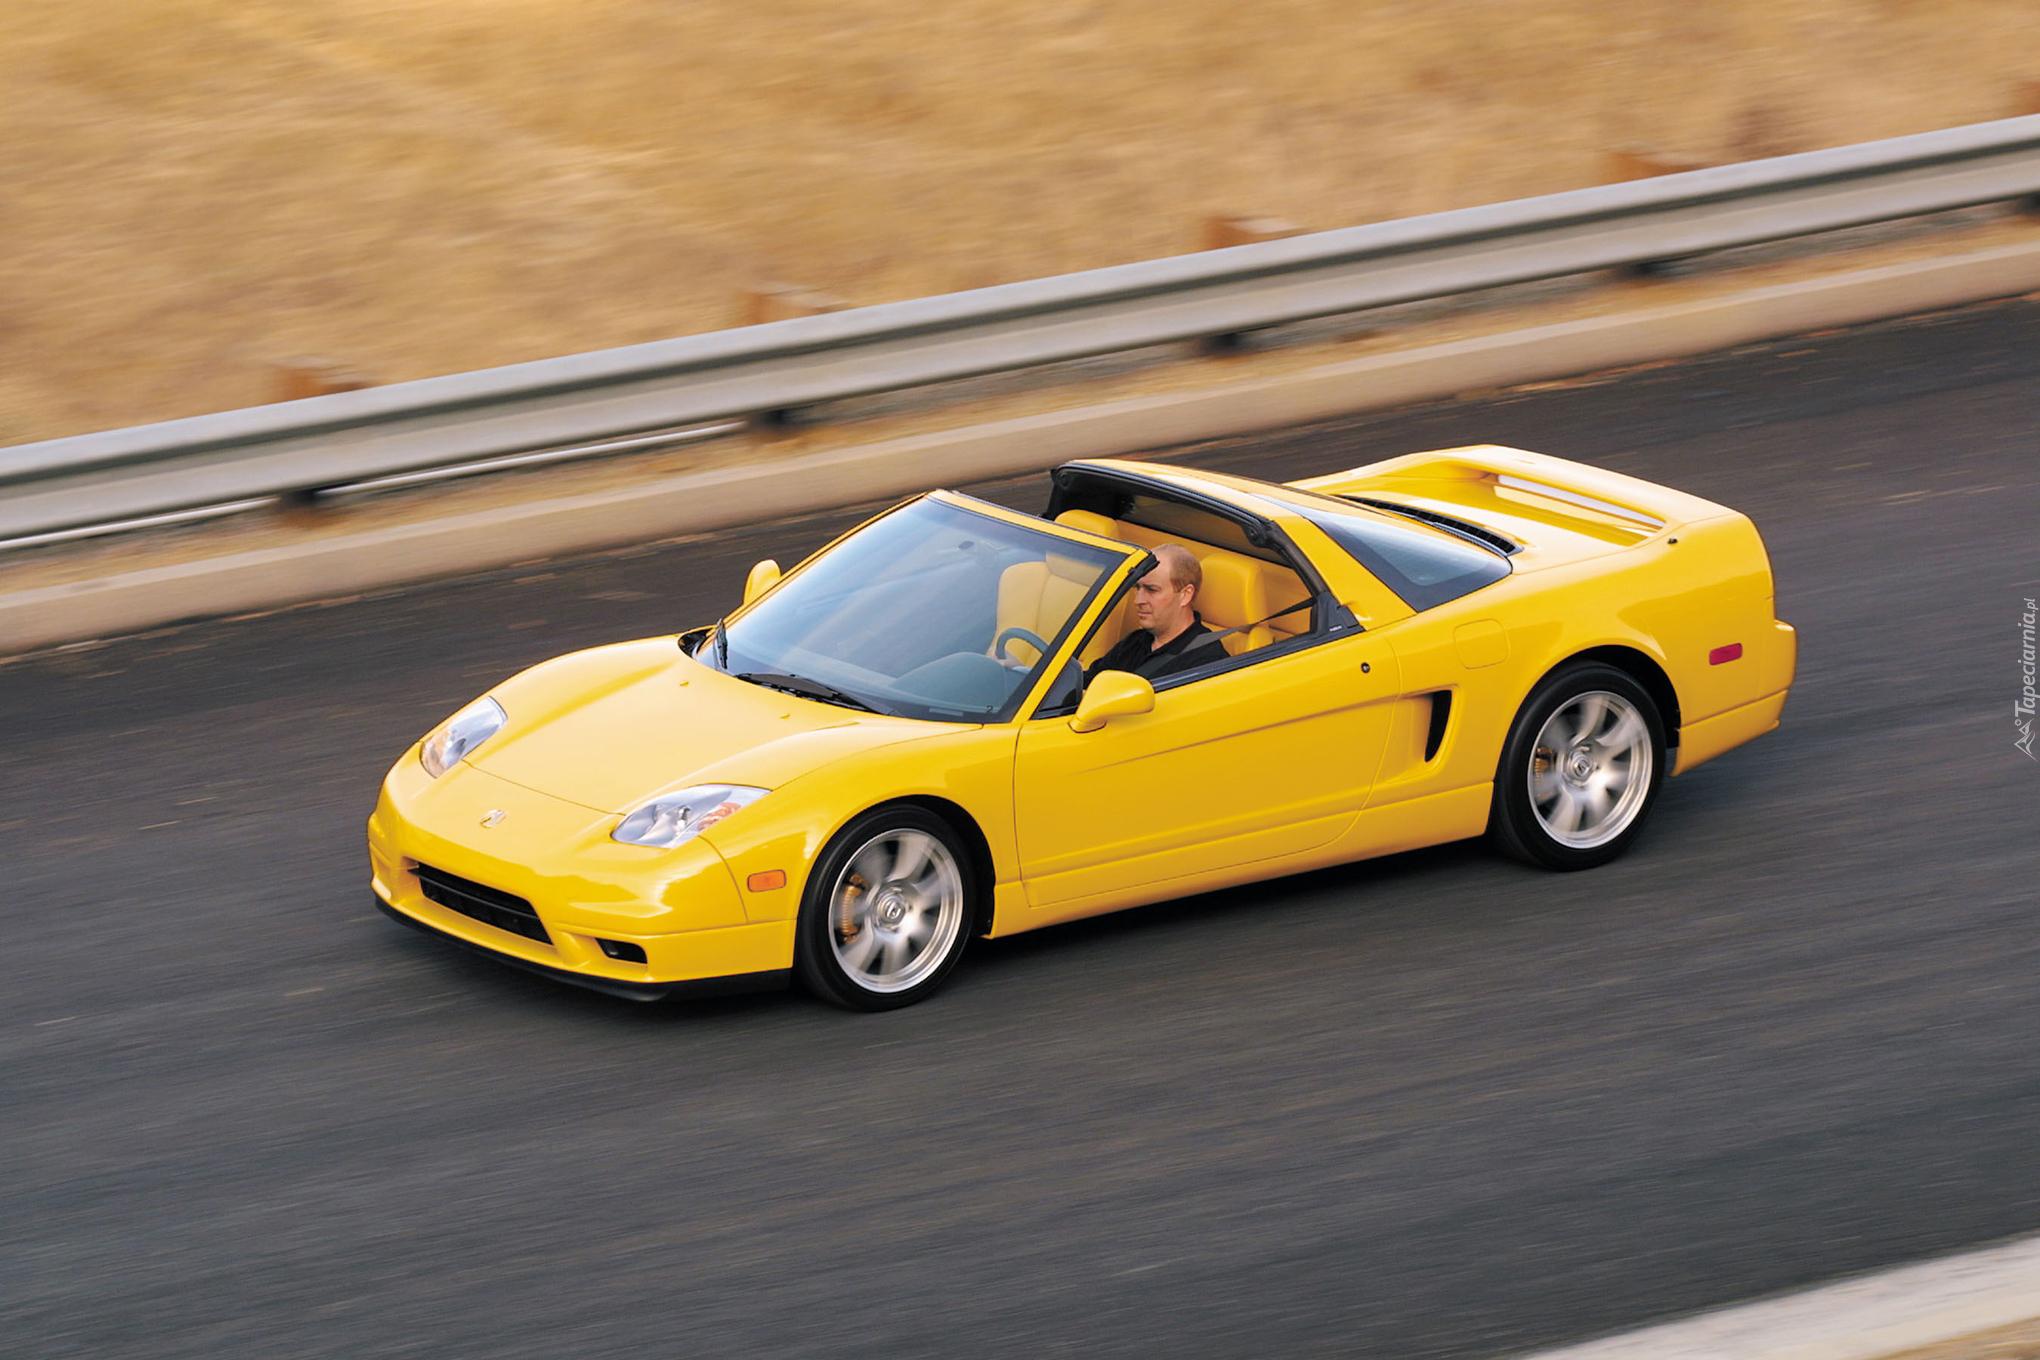 Похожие фото Acura Nsx 2001.